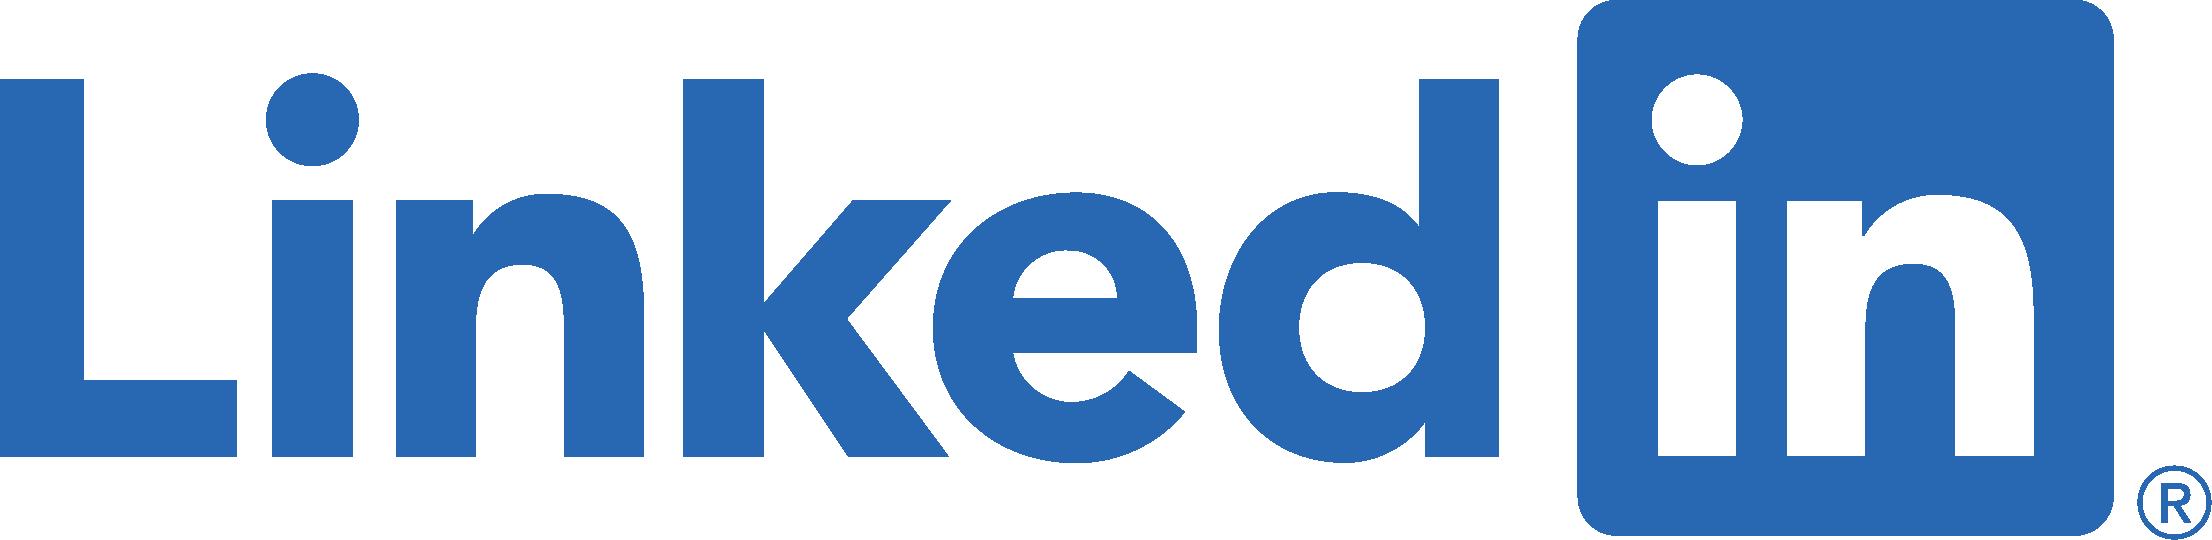 https://ppforum.ca/wp-content/uploads/2020/11/LinkedIn-Logo.png